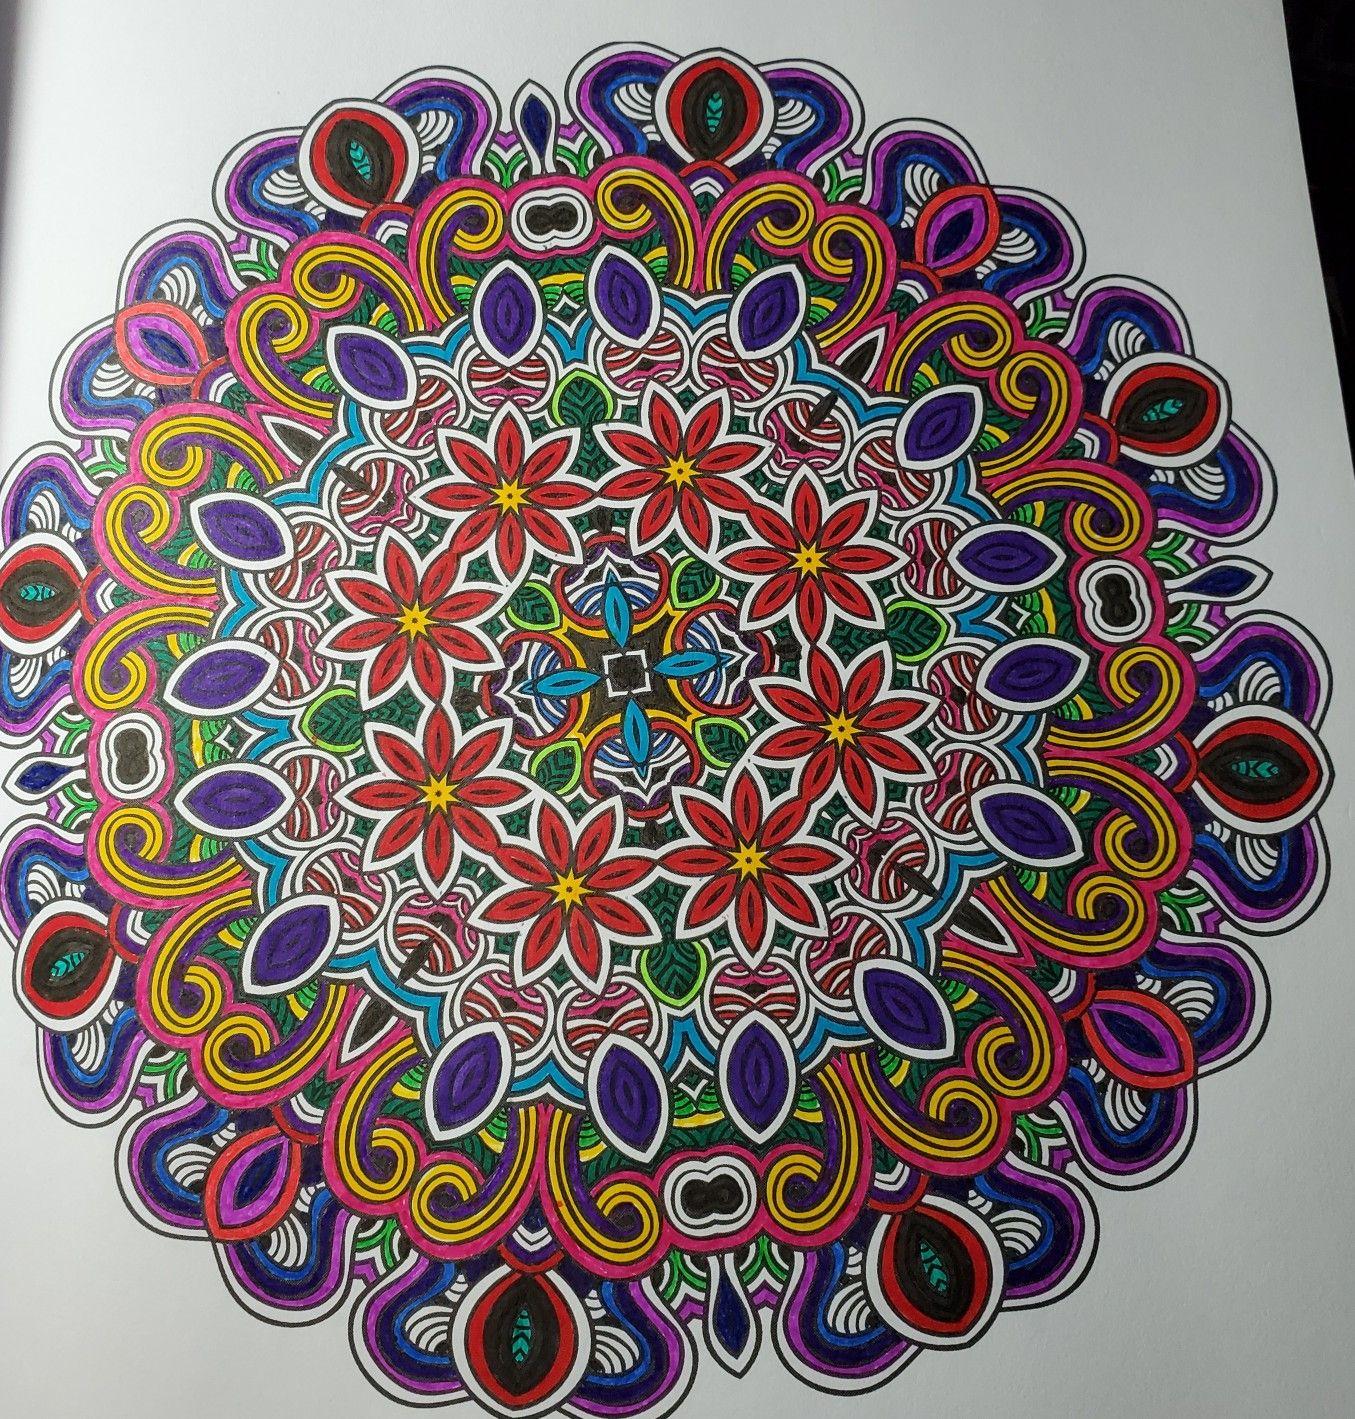 Insane Mandalas Vol 3 The World S Hardest Coloring Book By Marti Jo S Coloring Book Art Coloring Books Book Art